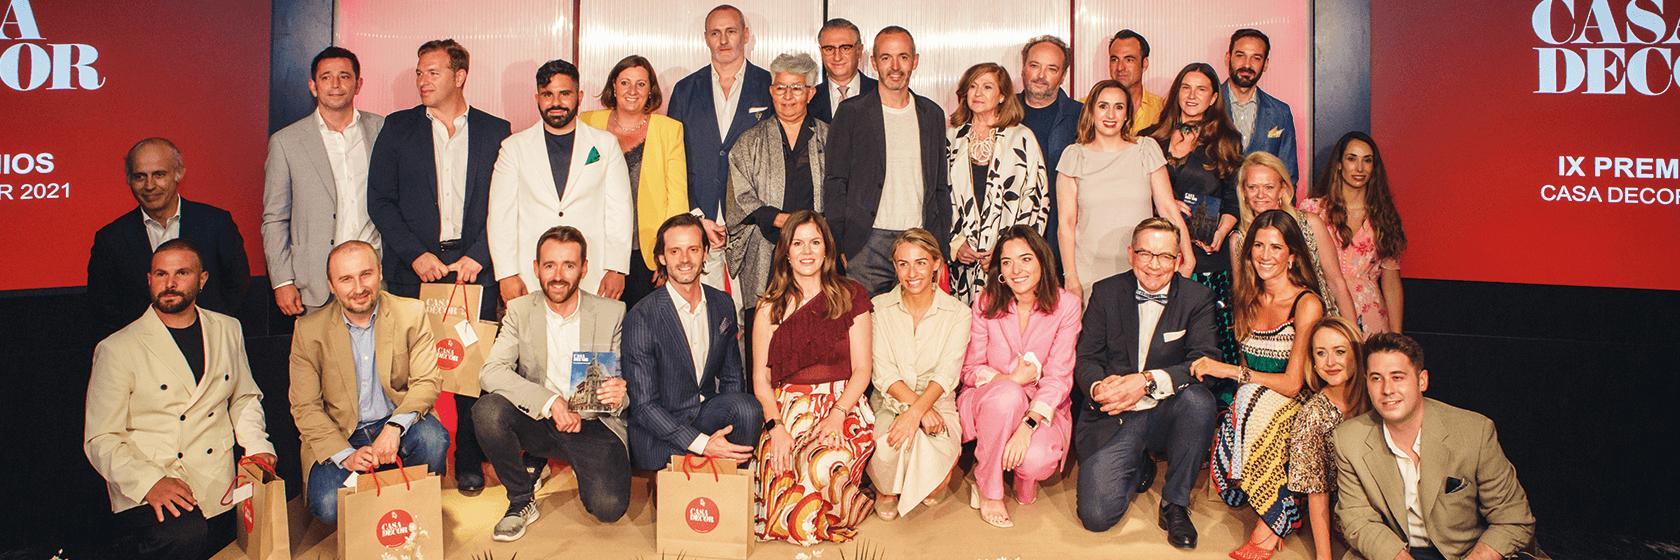 Best Casa Decor 2021 Project Award | The Room Studio